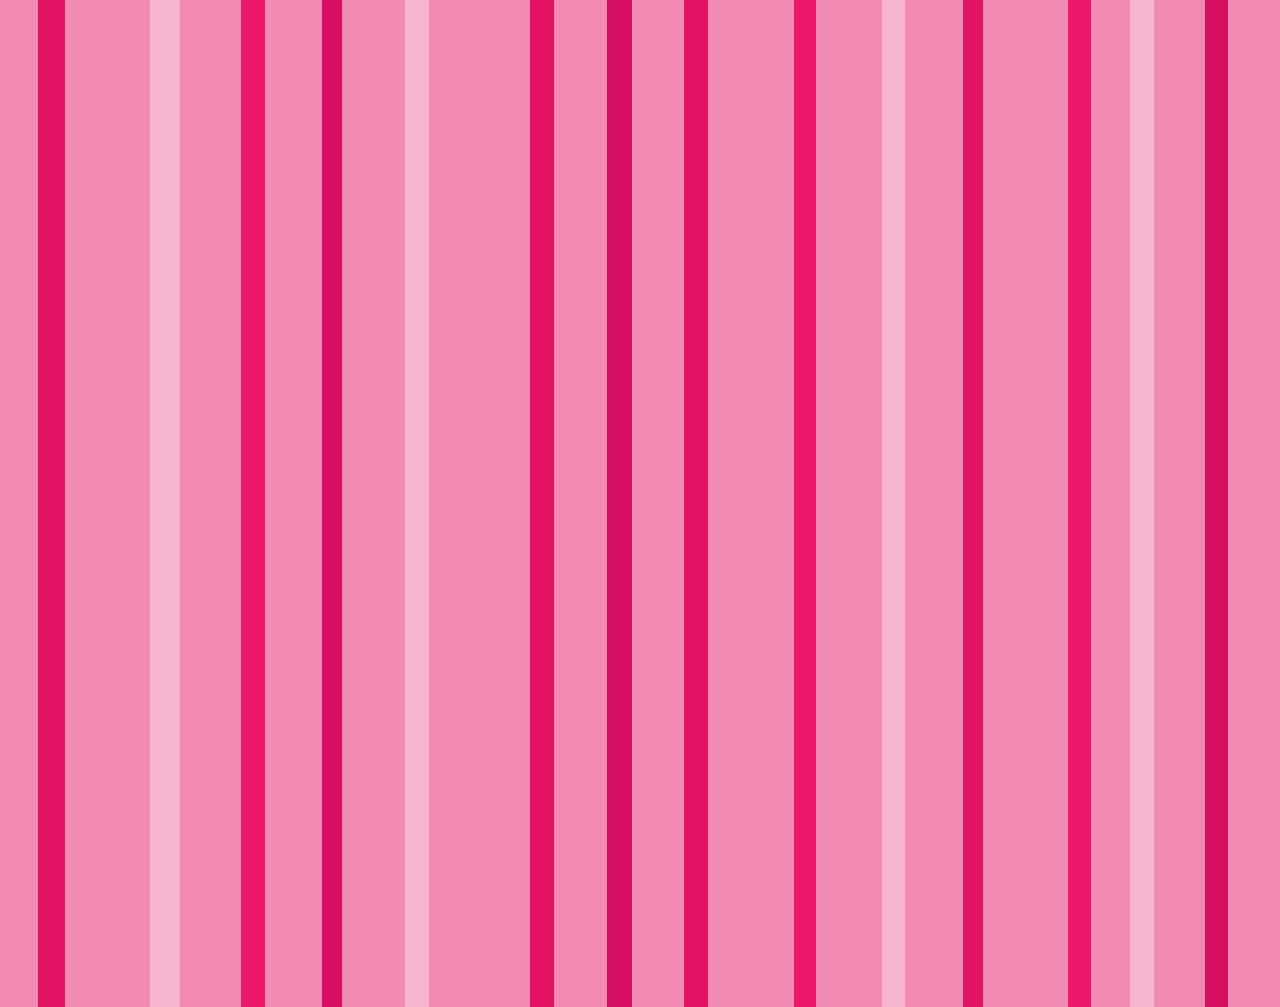 Light Pink Diagonal Stripes